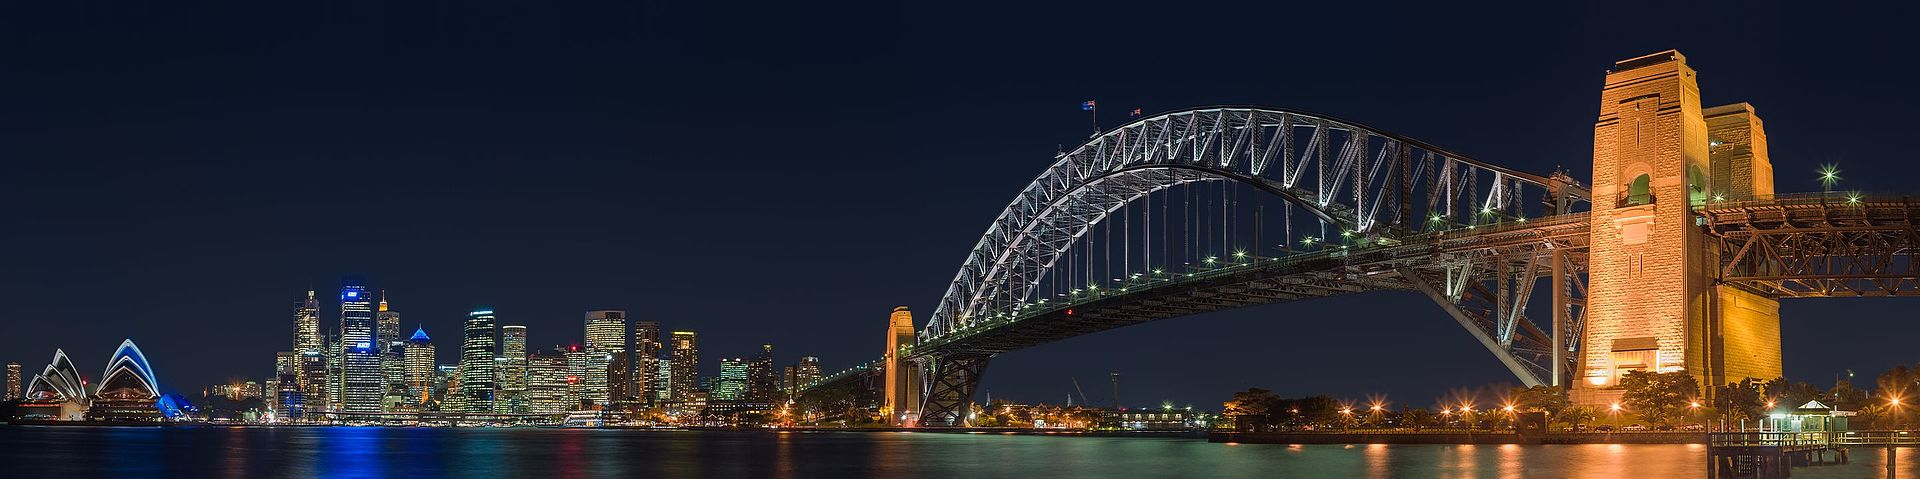 Sydney_Harbour_Bridge_night